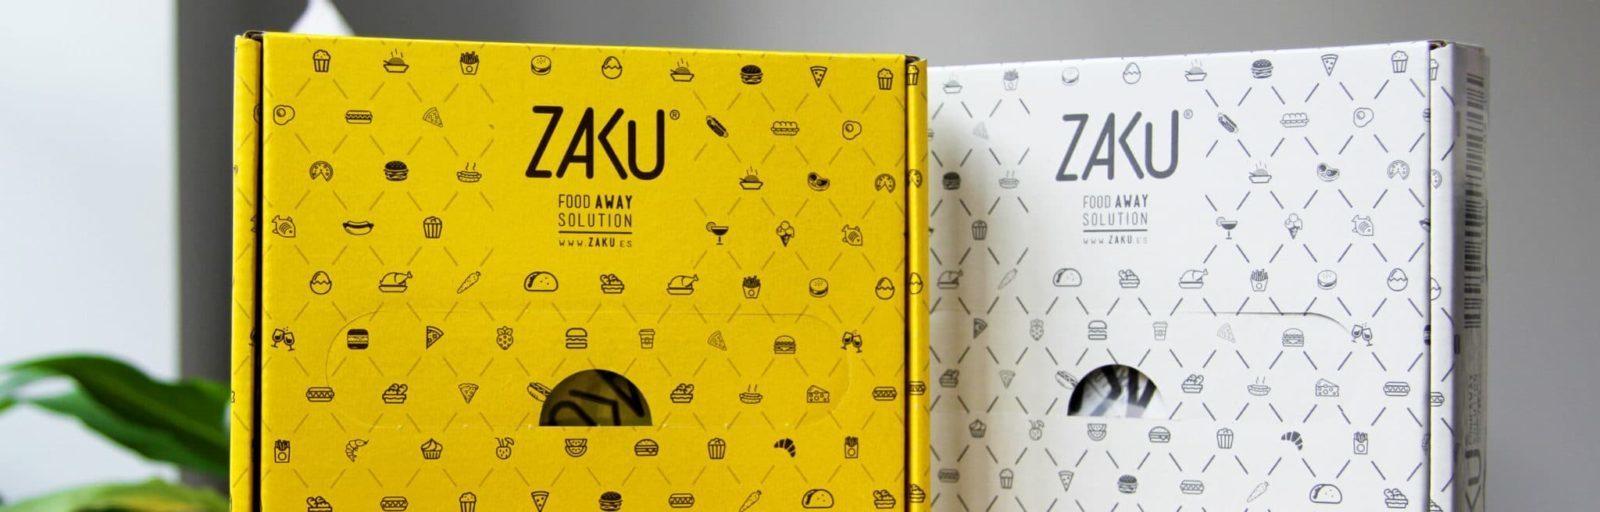 Diseño de caja Zaku